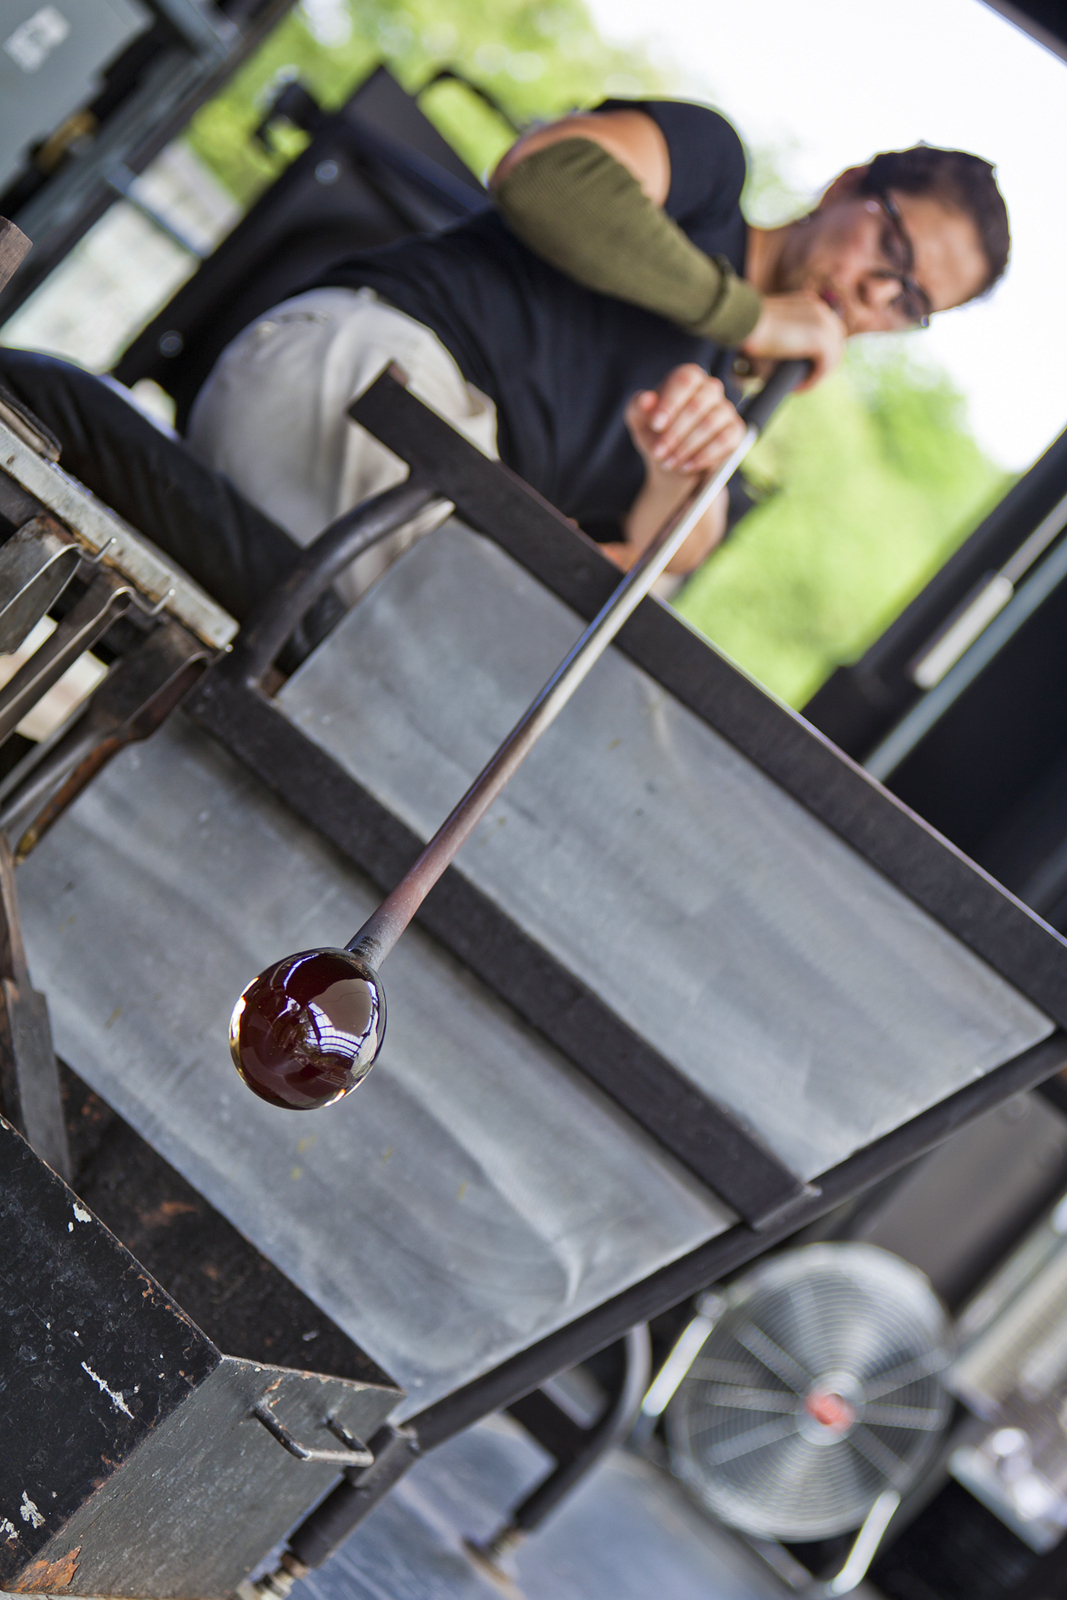 Glassmaker Annette Sheppard works with designer Jon Otis at GlassLab in Corning, July 2012